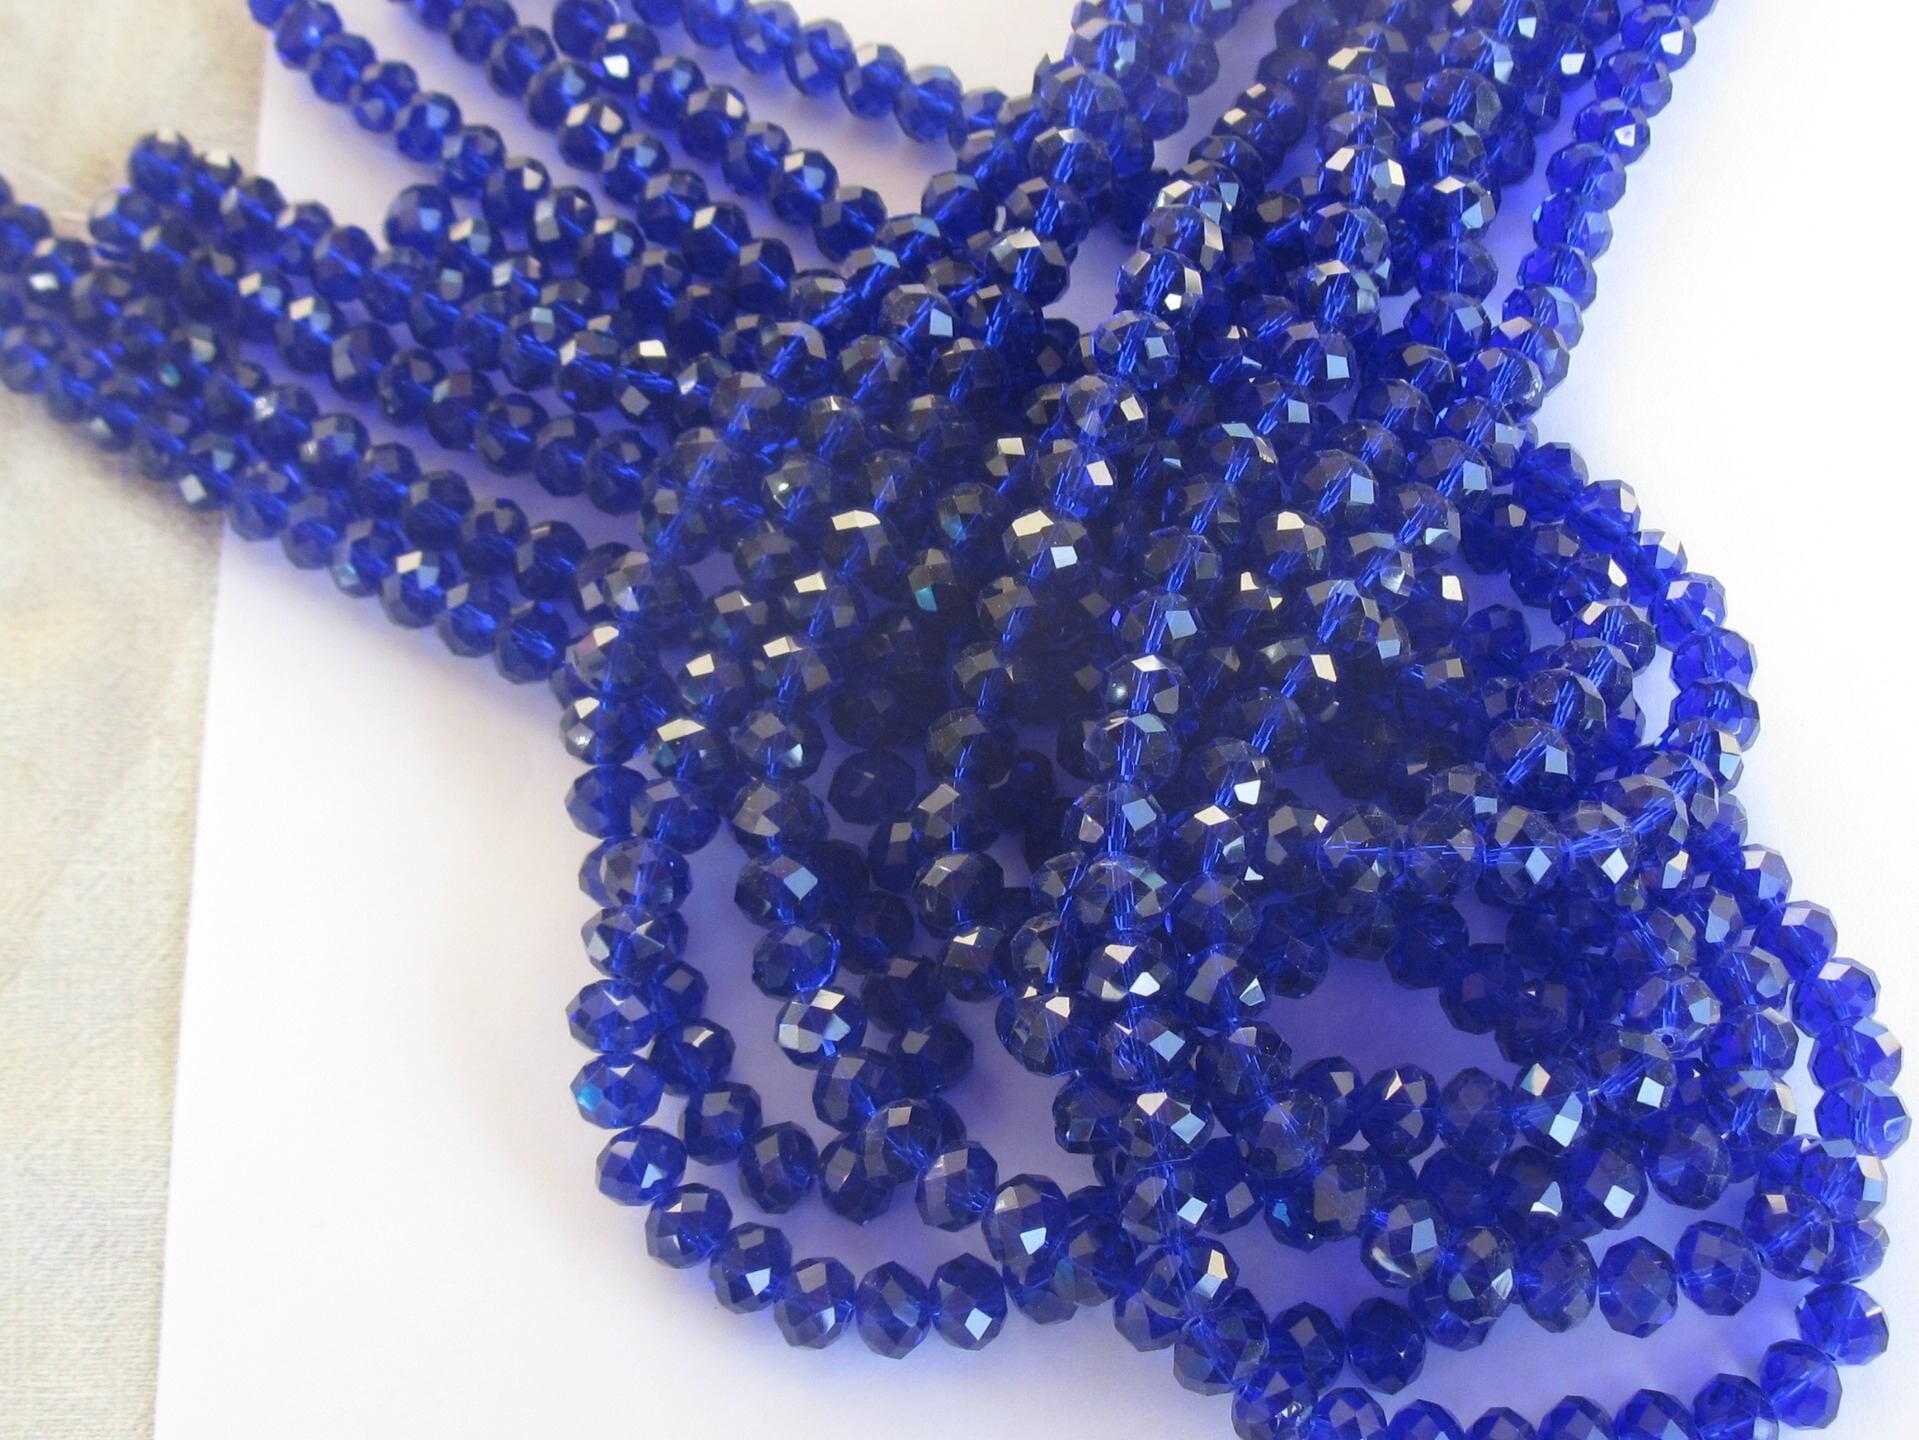 16 perles en verre facette couleur bleu saphir 10mm 49. Black Bedroom Furniture Sets. Home Design Ideas